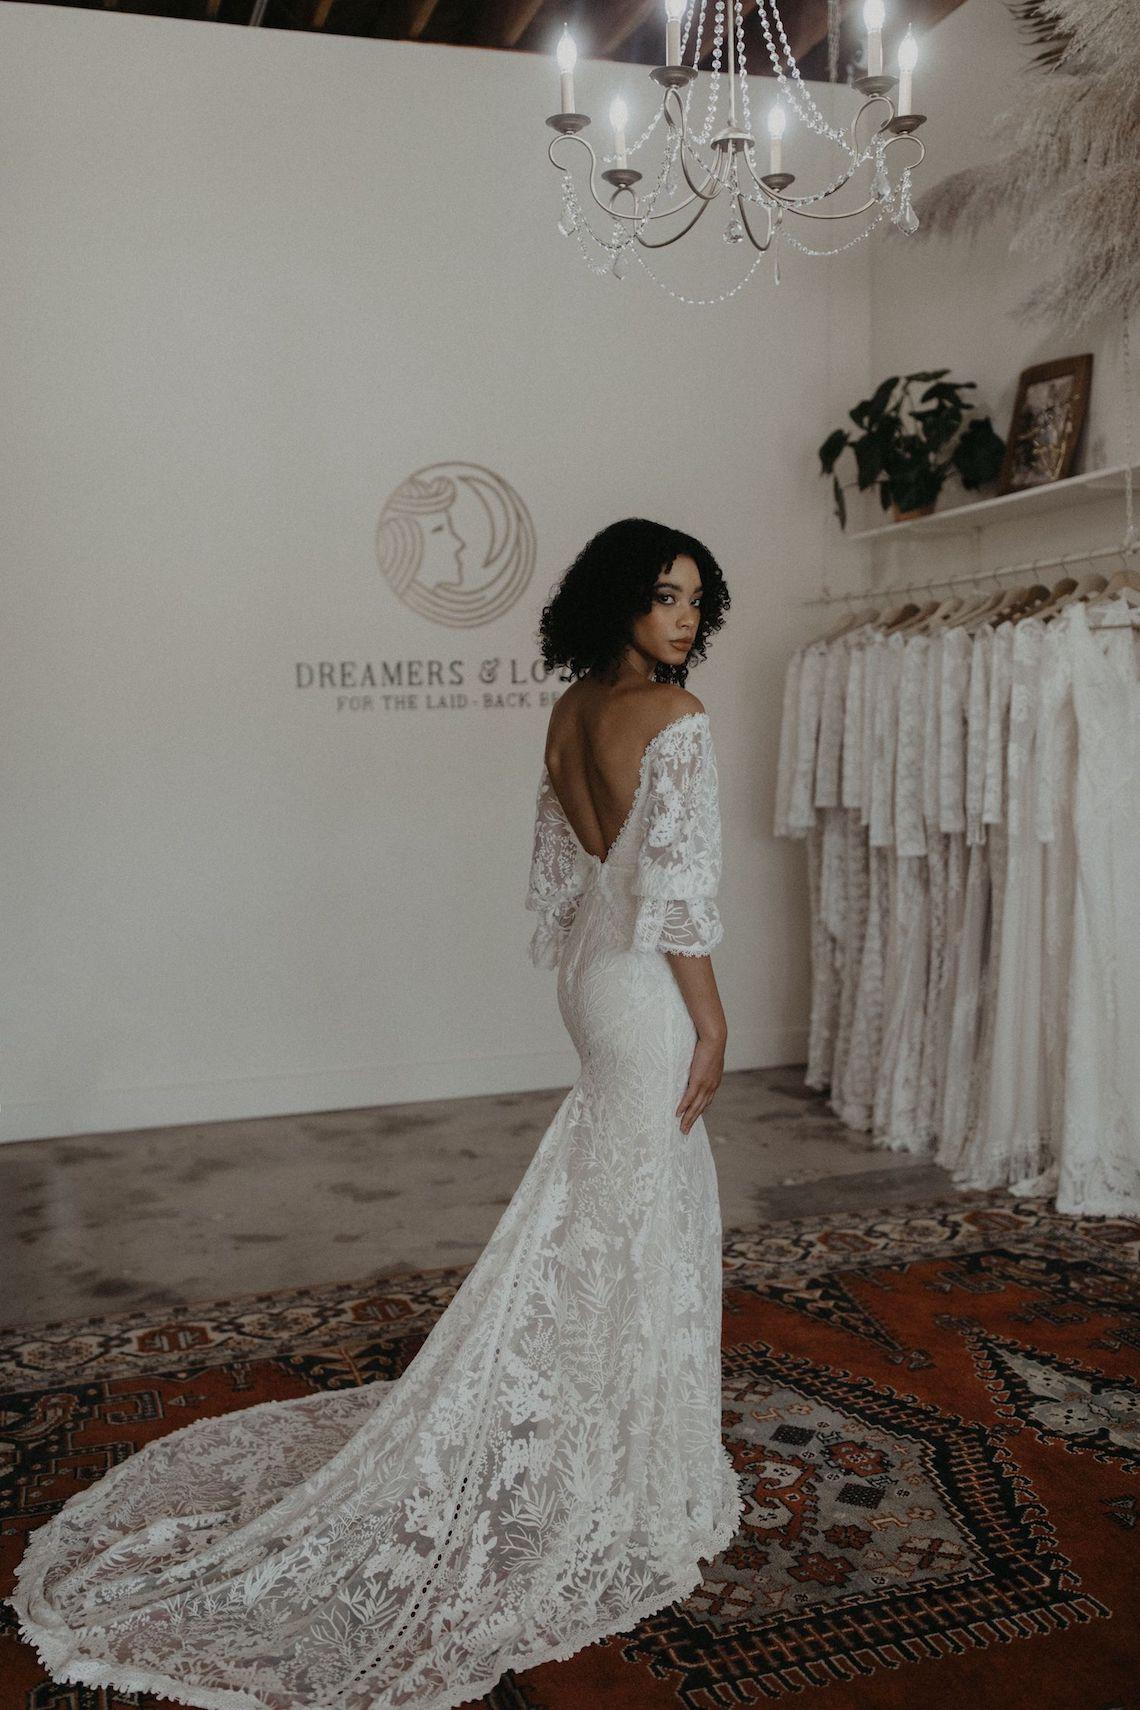 Dreamers and Lovers New Bohemian Wedding Dresses and LA Flagship Bridal Salon – Bridal Musings – Naomi Boho Wedding Dress 1